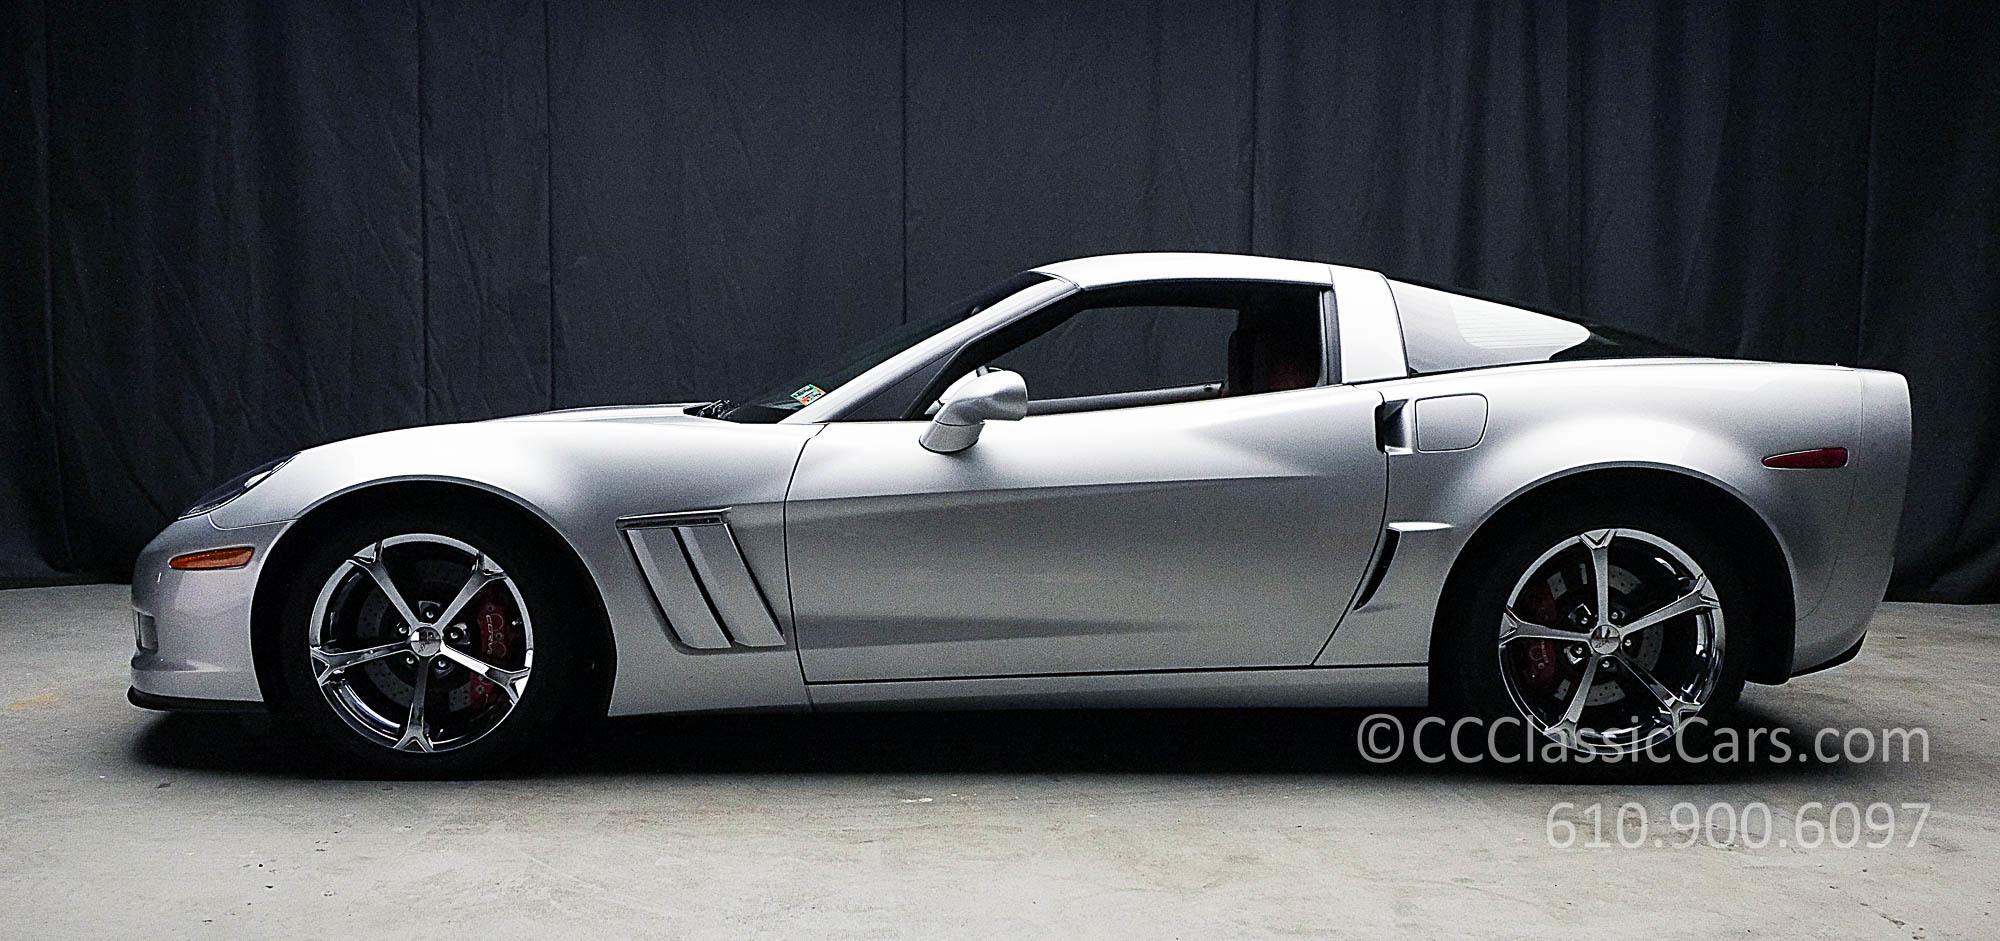 2012 Chevrolet Corvette Silver